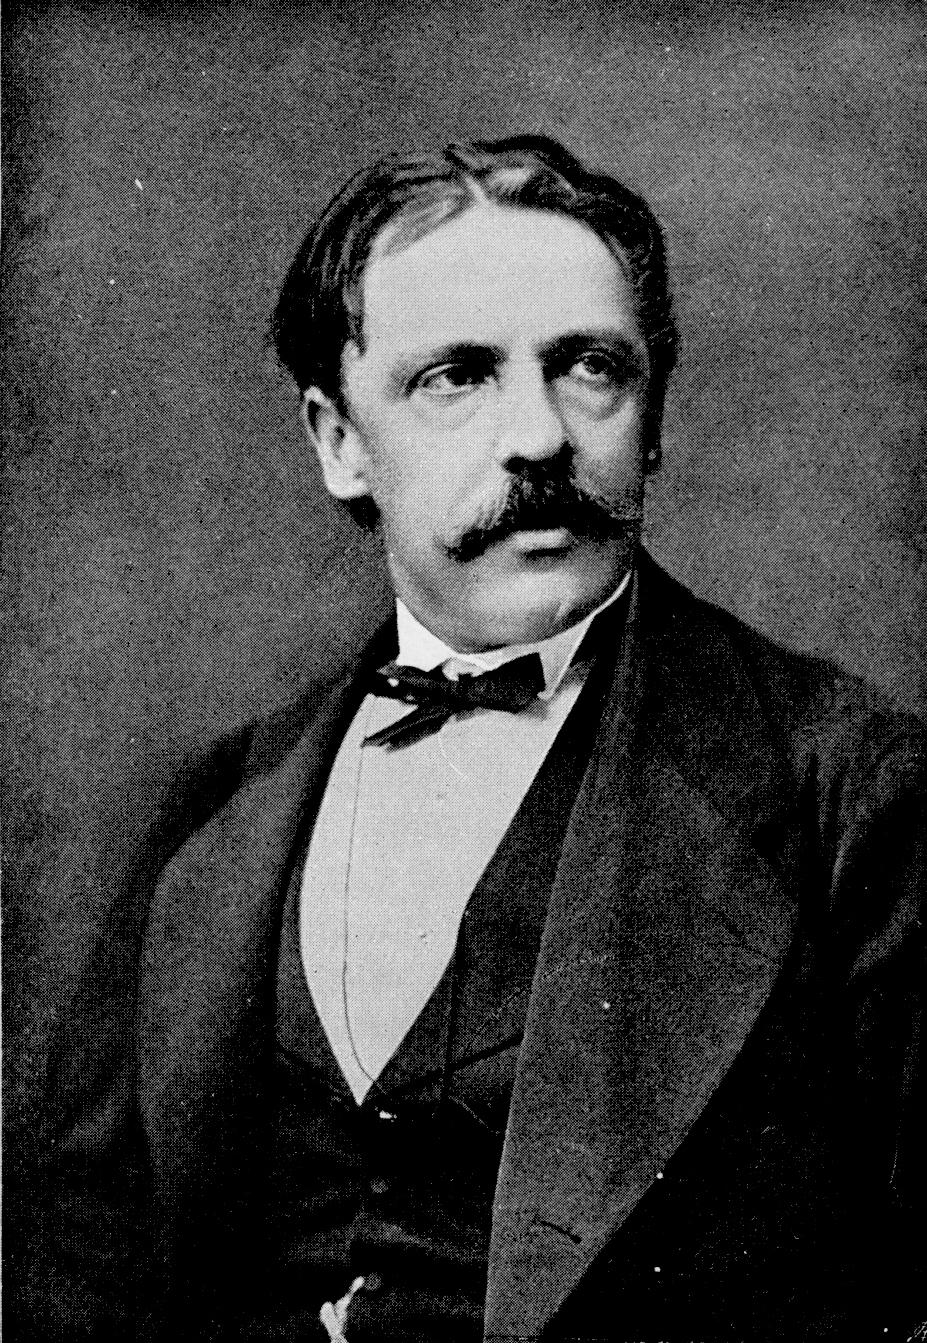 Viktor Rydberg 1876. Bild via Wikimedia Commons.